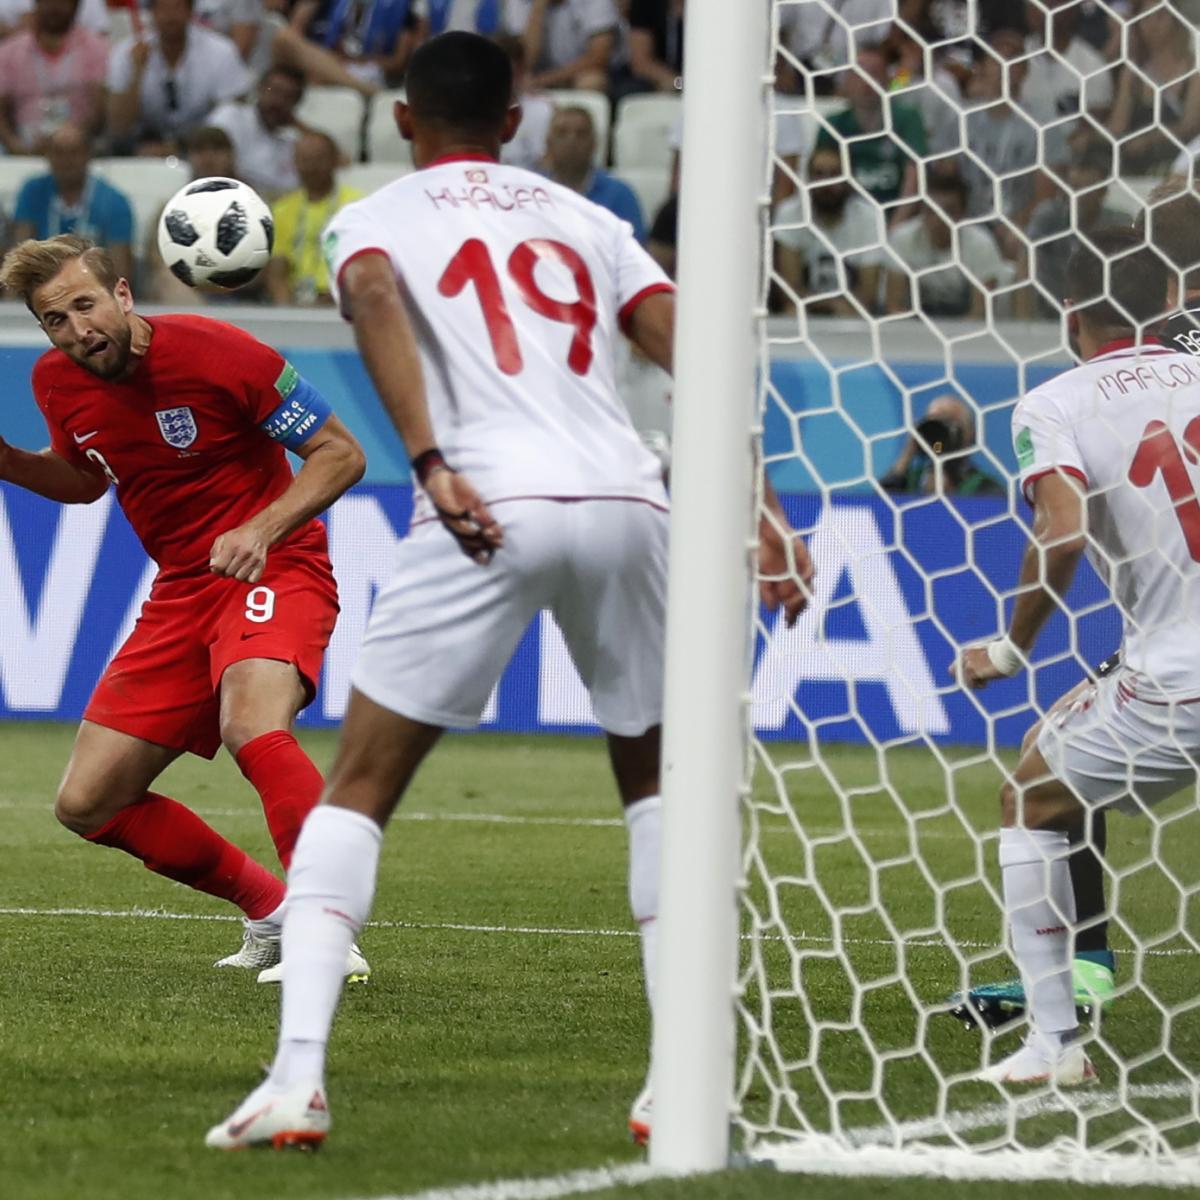 Tottenham 3 Fulham 1 Match Highlights Harry Kane Scores: World Cup 2018: Group Scores, Highlights, Twitter Reaction